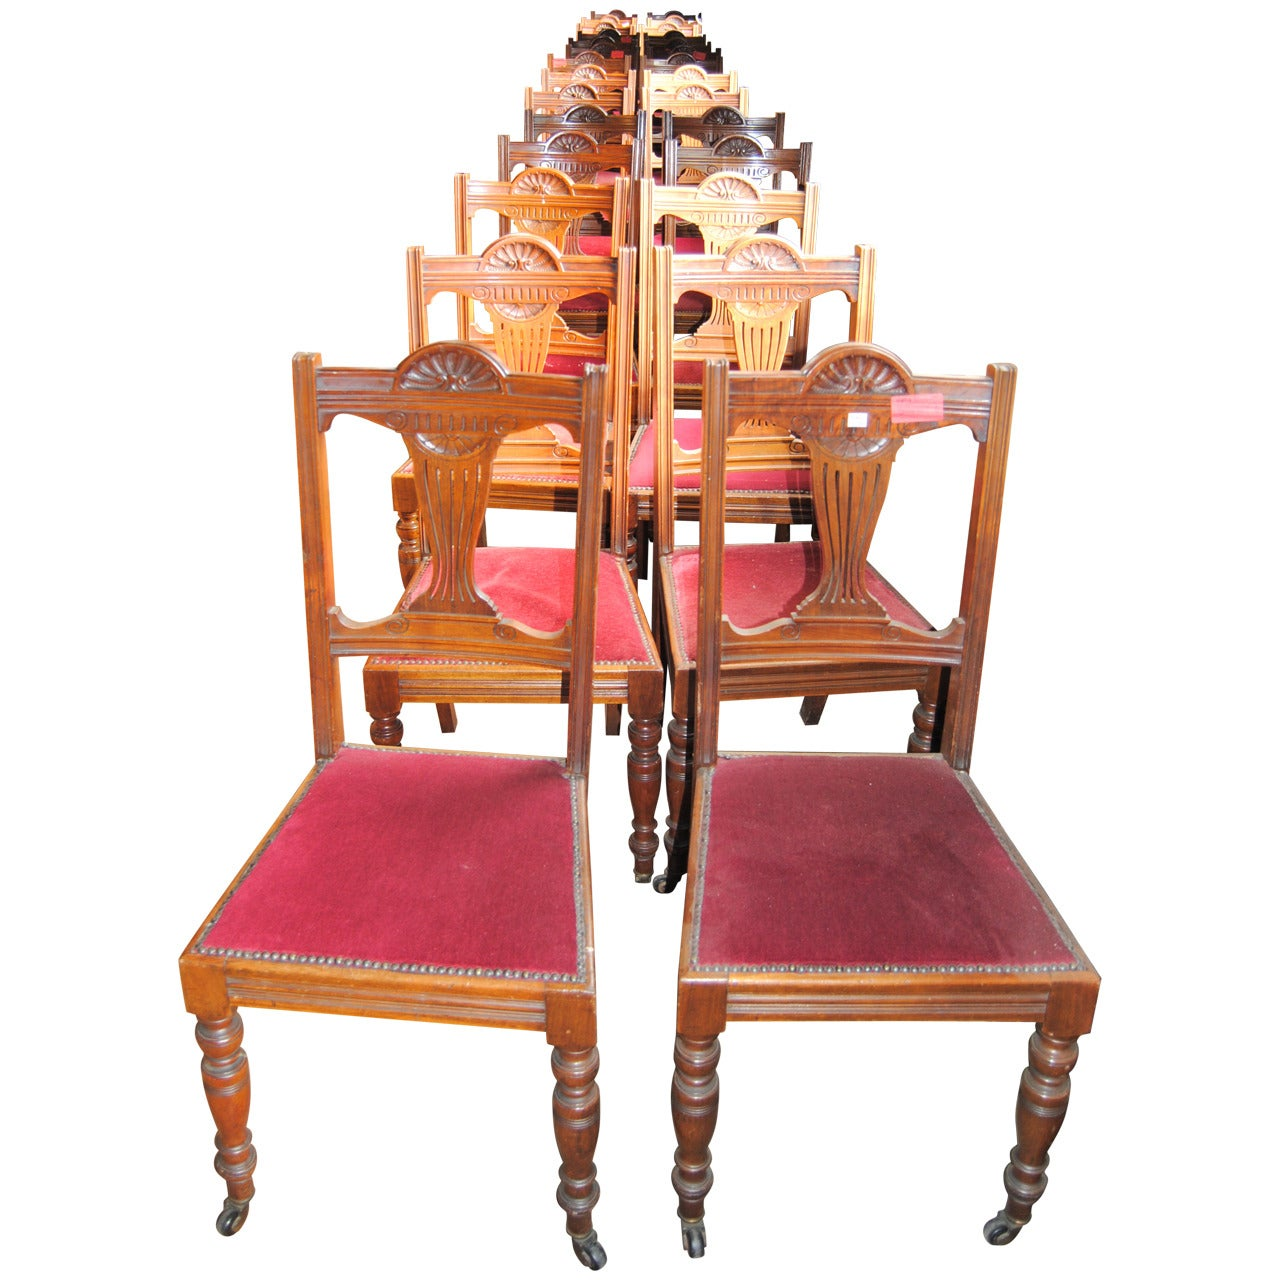 Set of 18 19th Century English Walnut Chairs